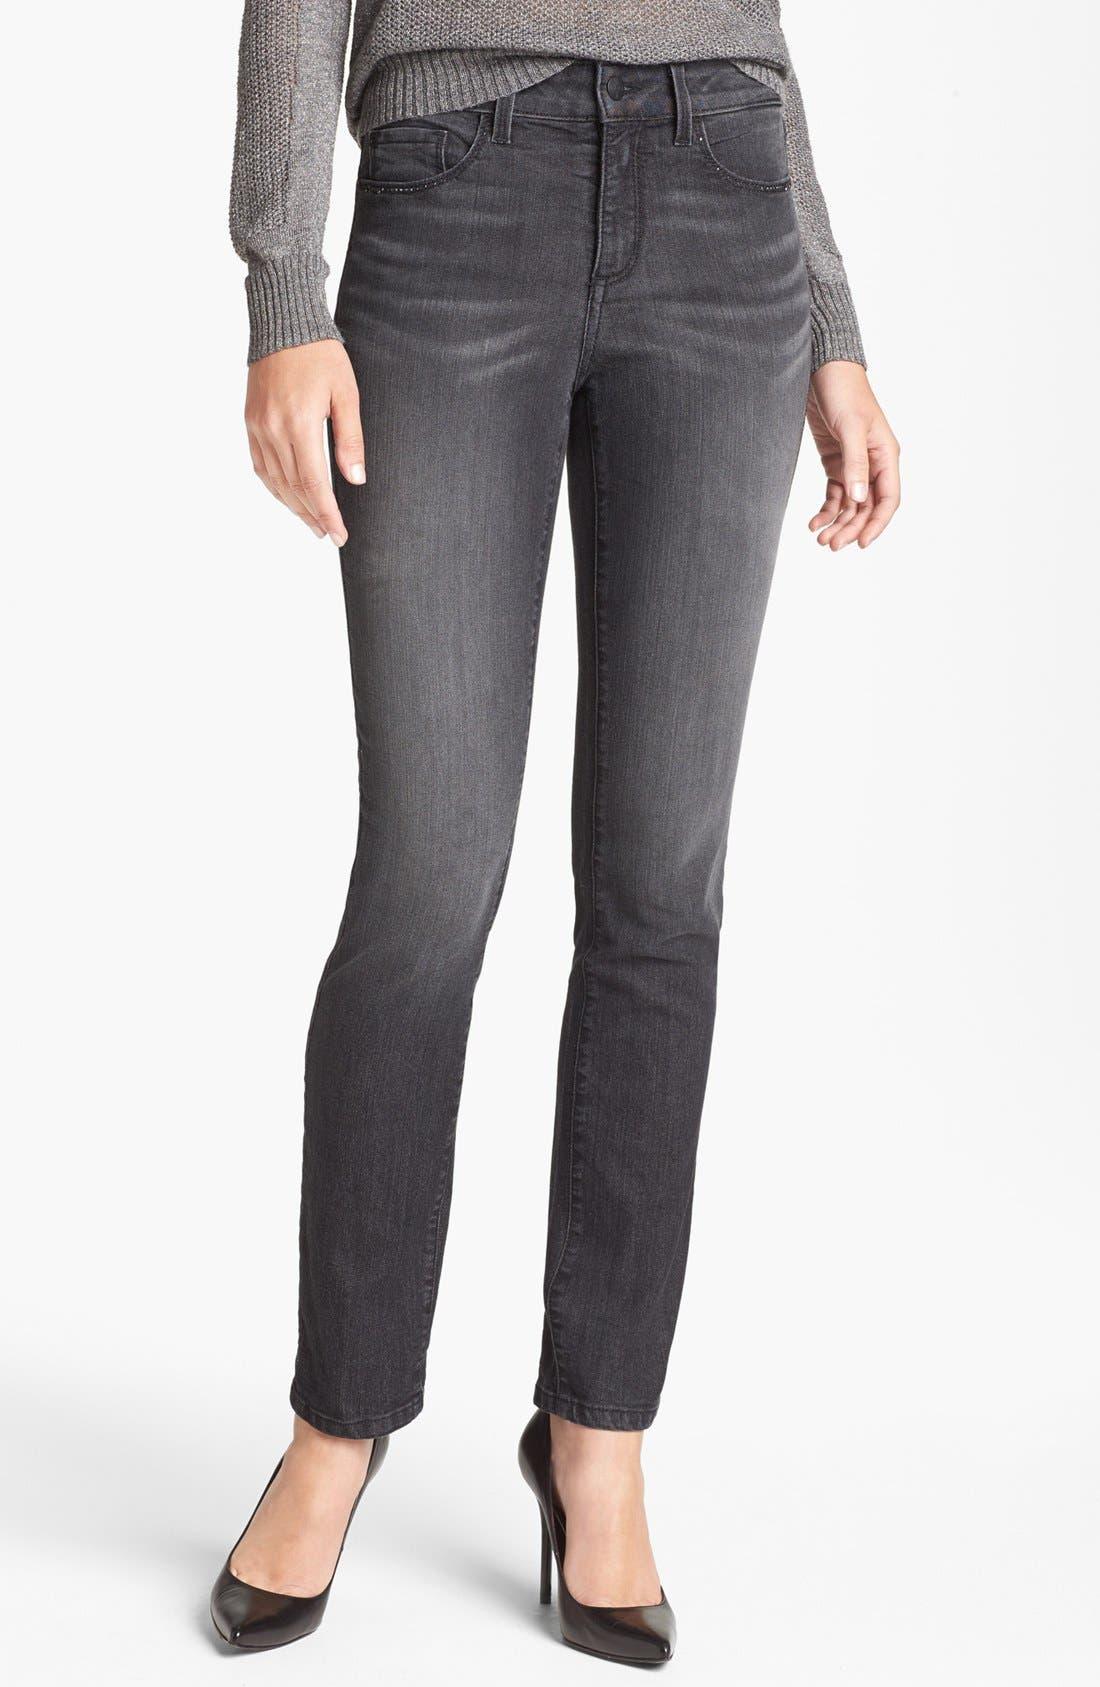 Alternate Image 1 Selected - NYDJ 'Alina' Stretch Skinny Jeans (Raven)